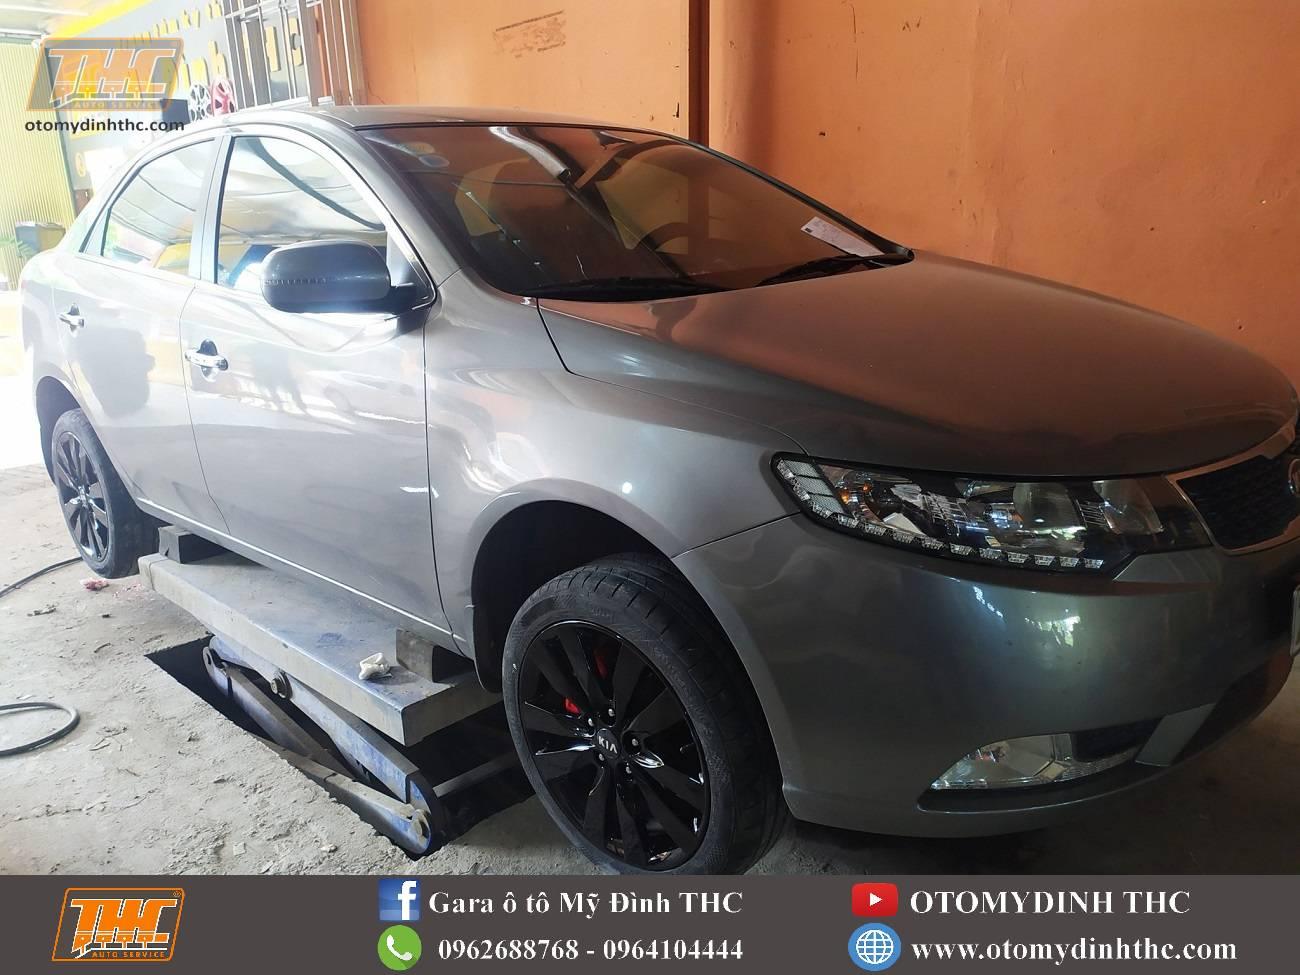 Sơn lazang- mâm xe cho xe Kia Forte